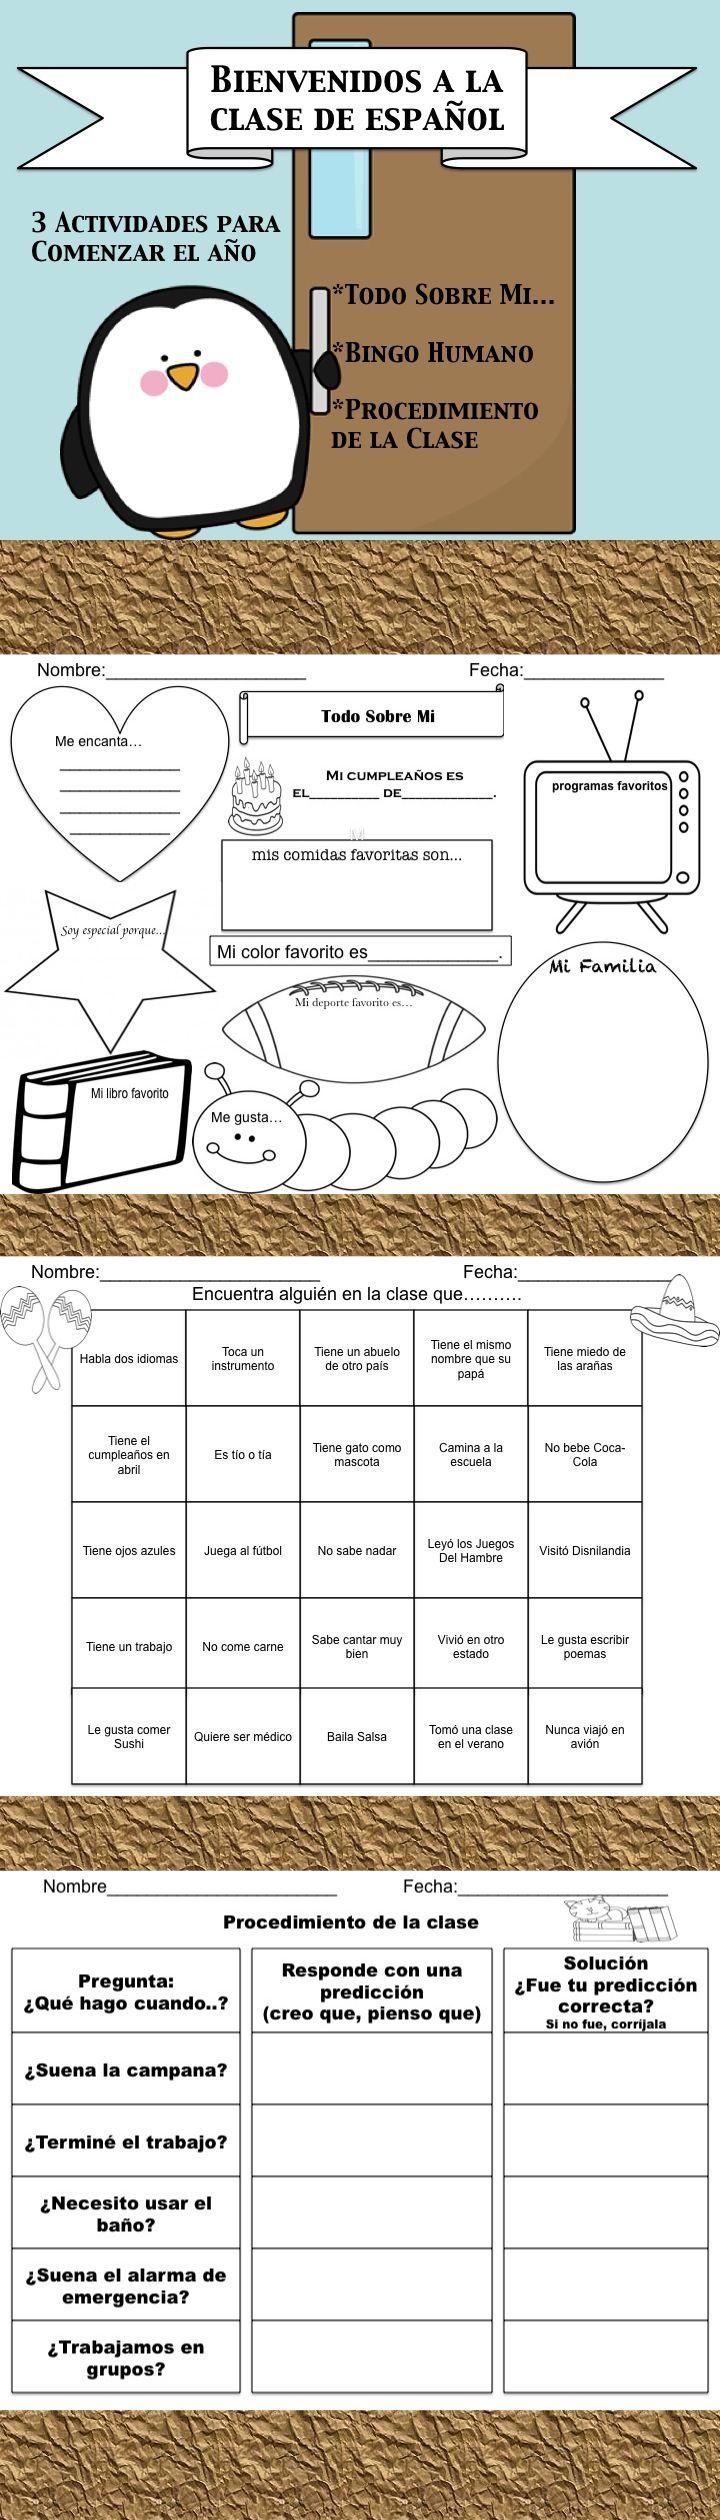 bienvenidos a la clase de espanol worksheets teaching